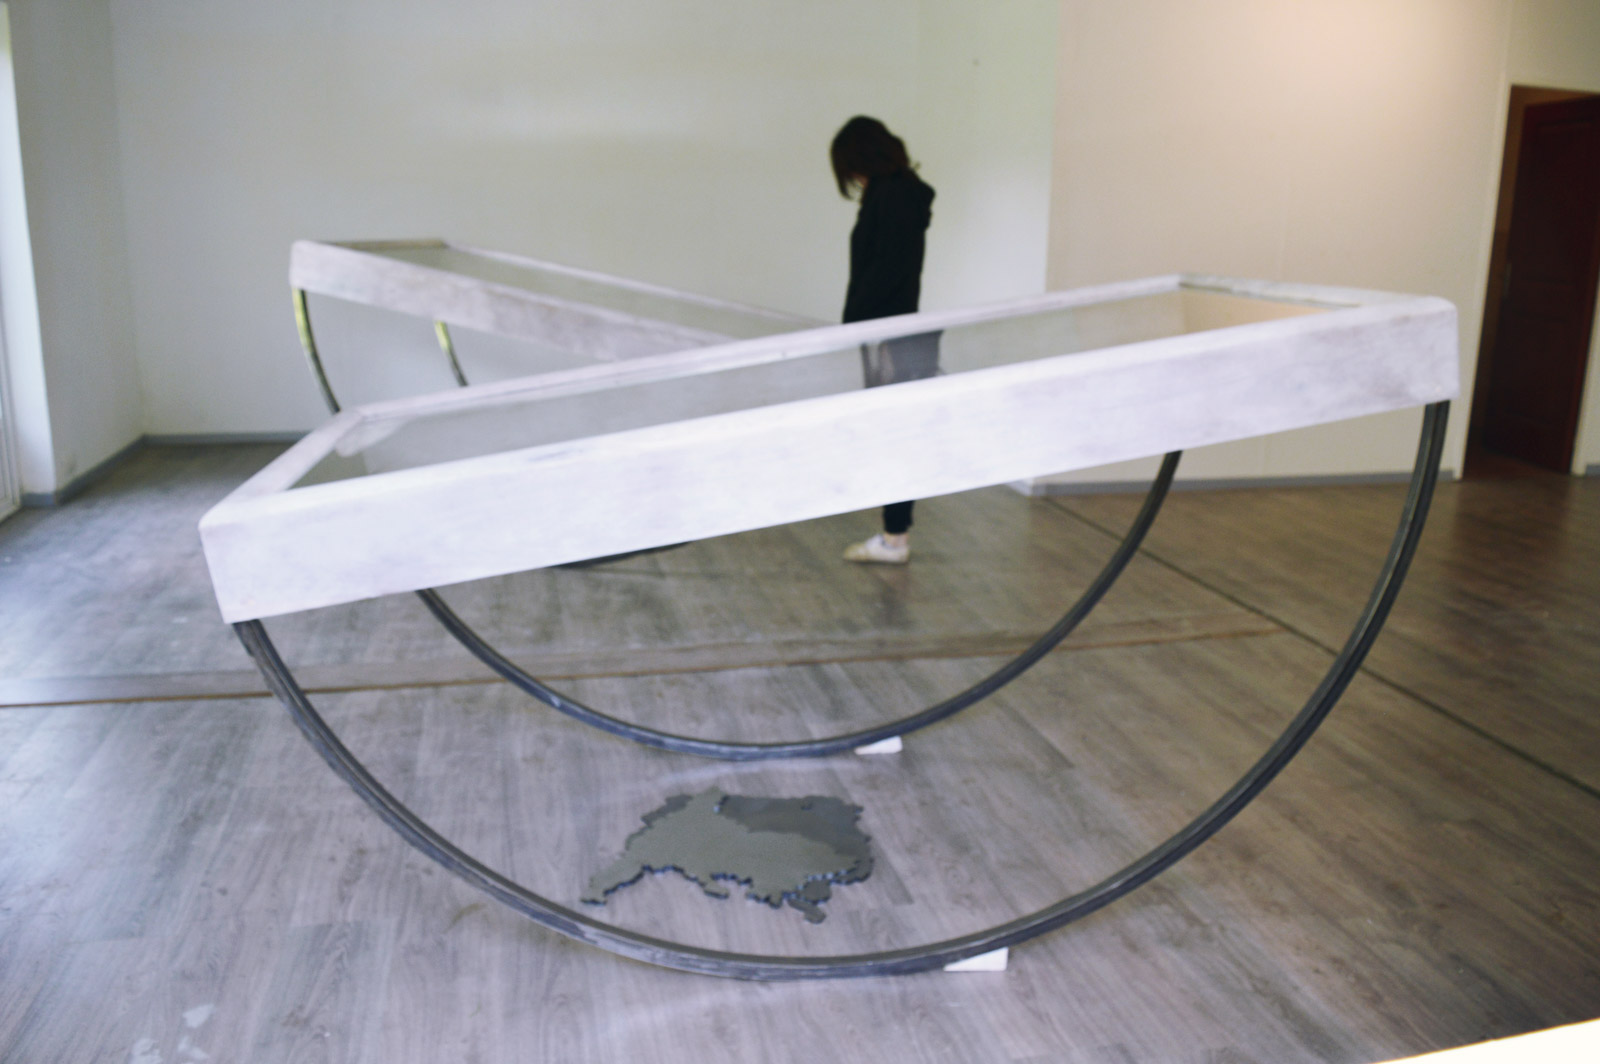 Lulù Nuti, 2015 - 100 x 200 x 150 cm - bois, métal, verre